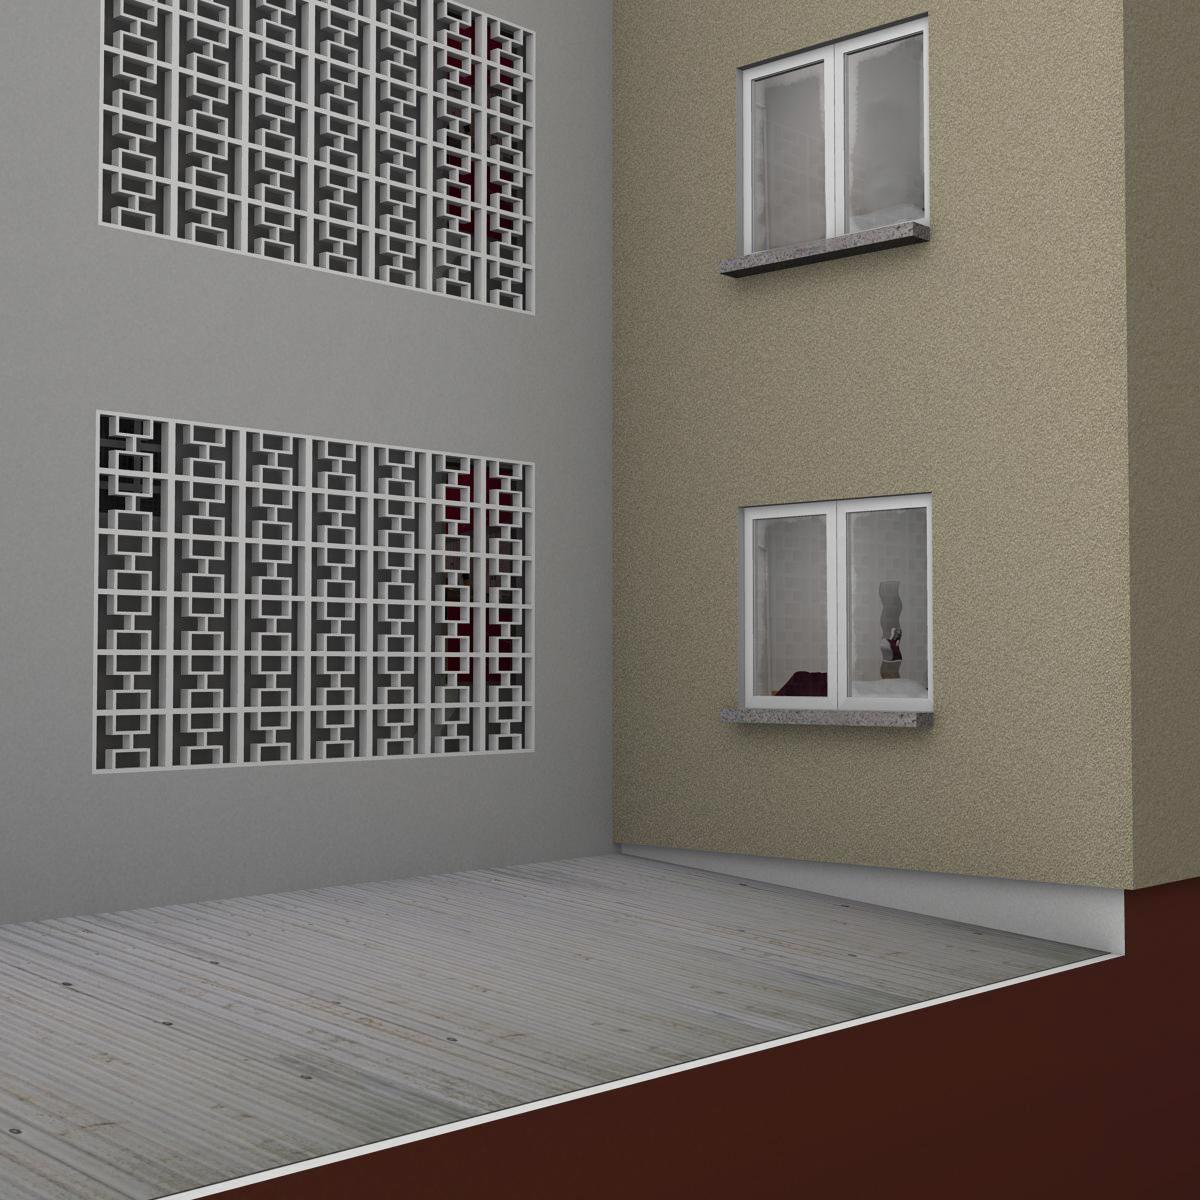 typical spanish building 3d model 3ds max fbx c4d ma mb obj 159491